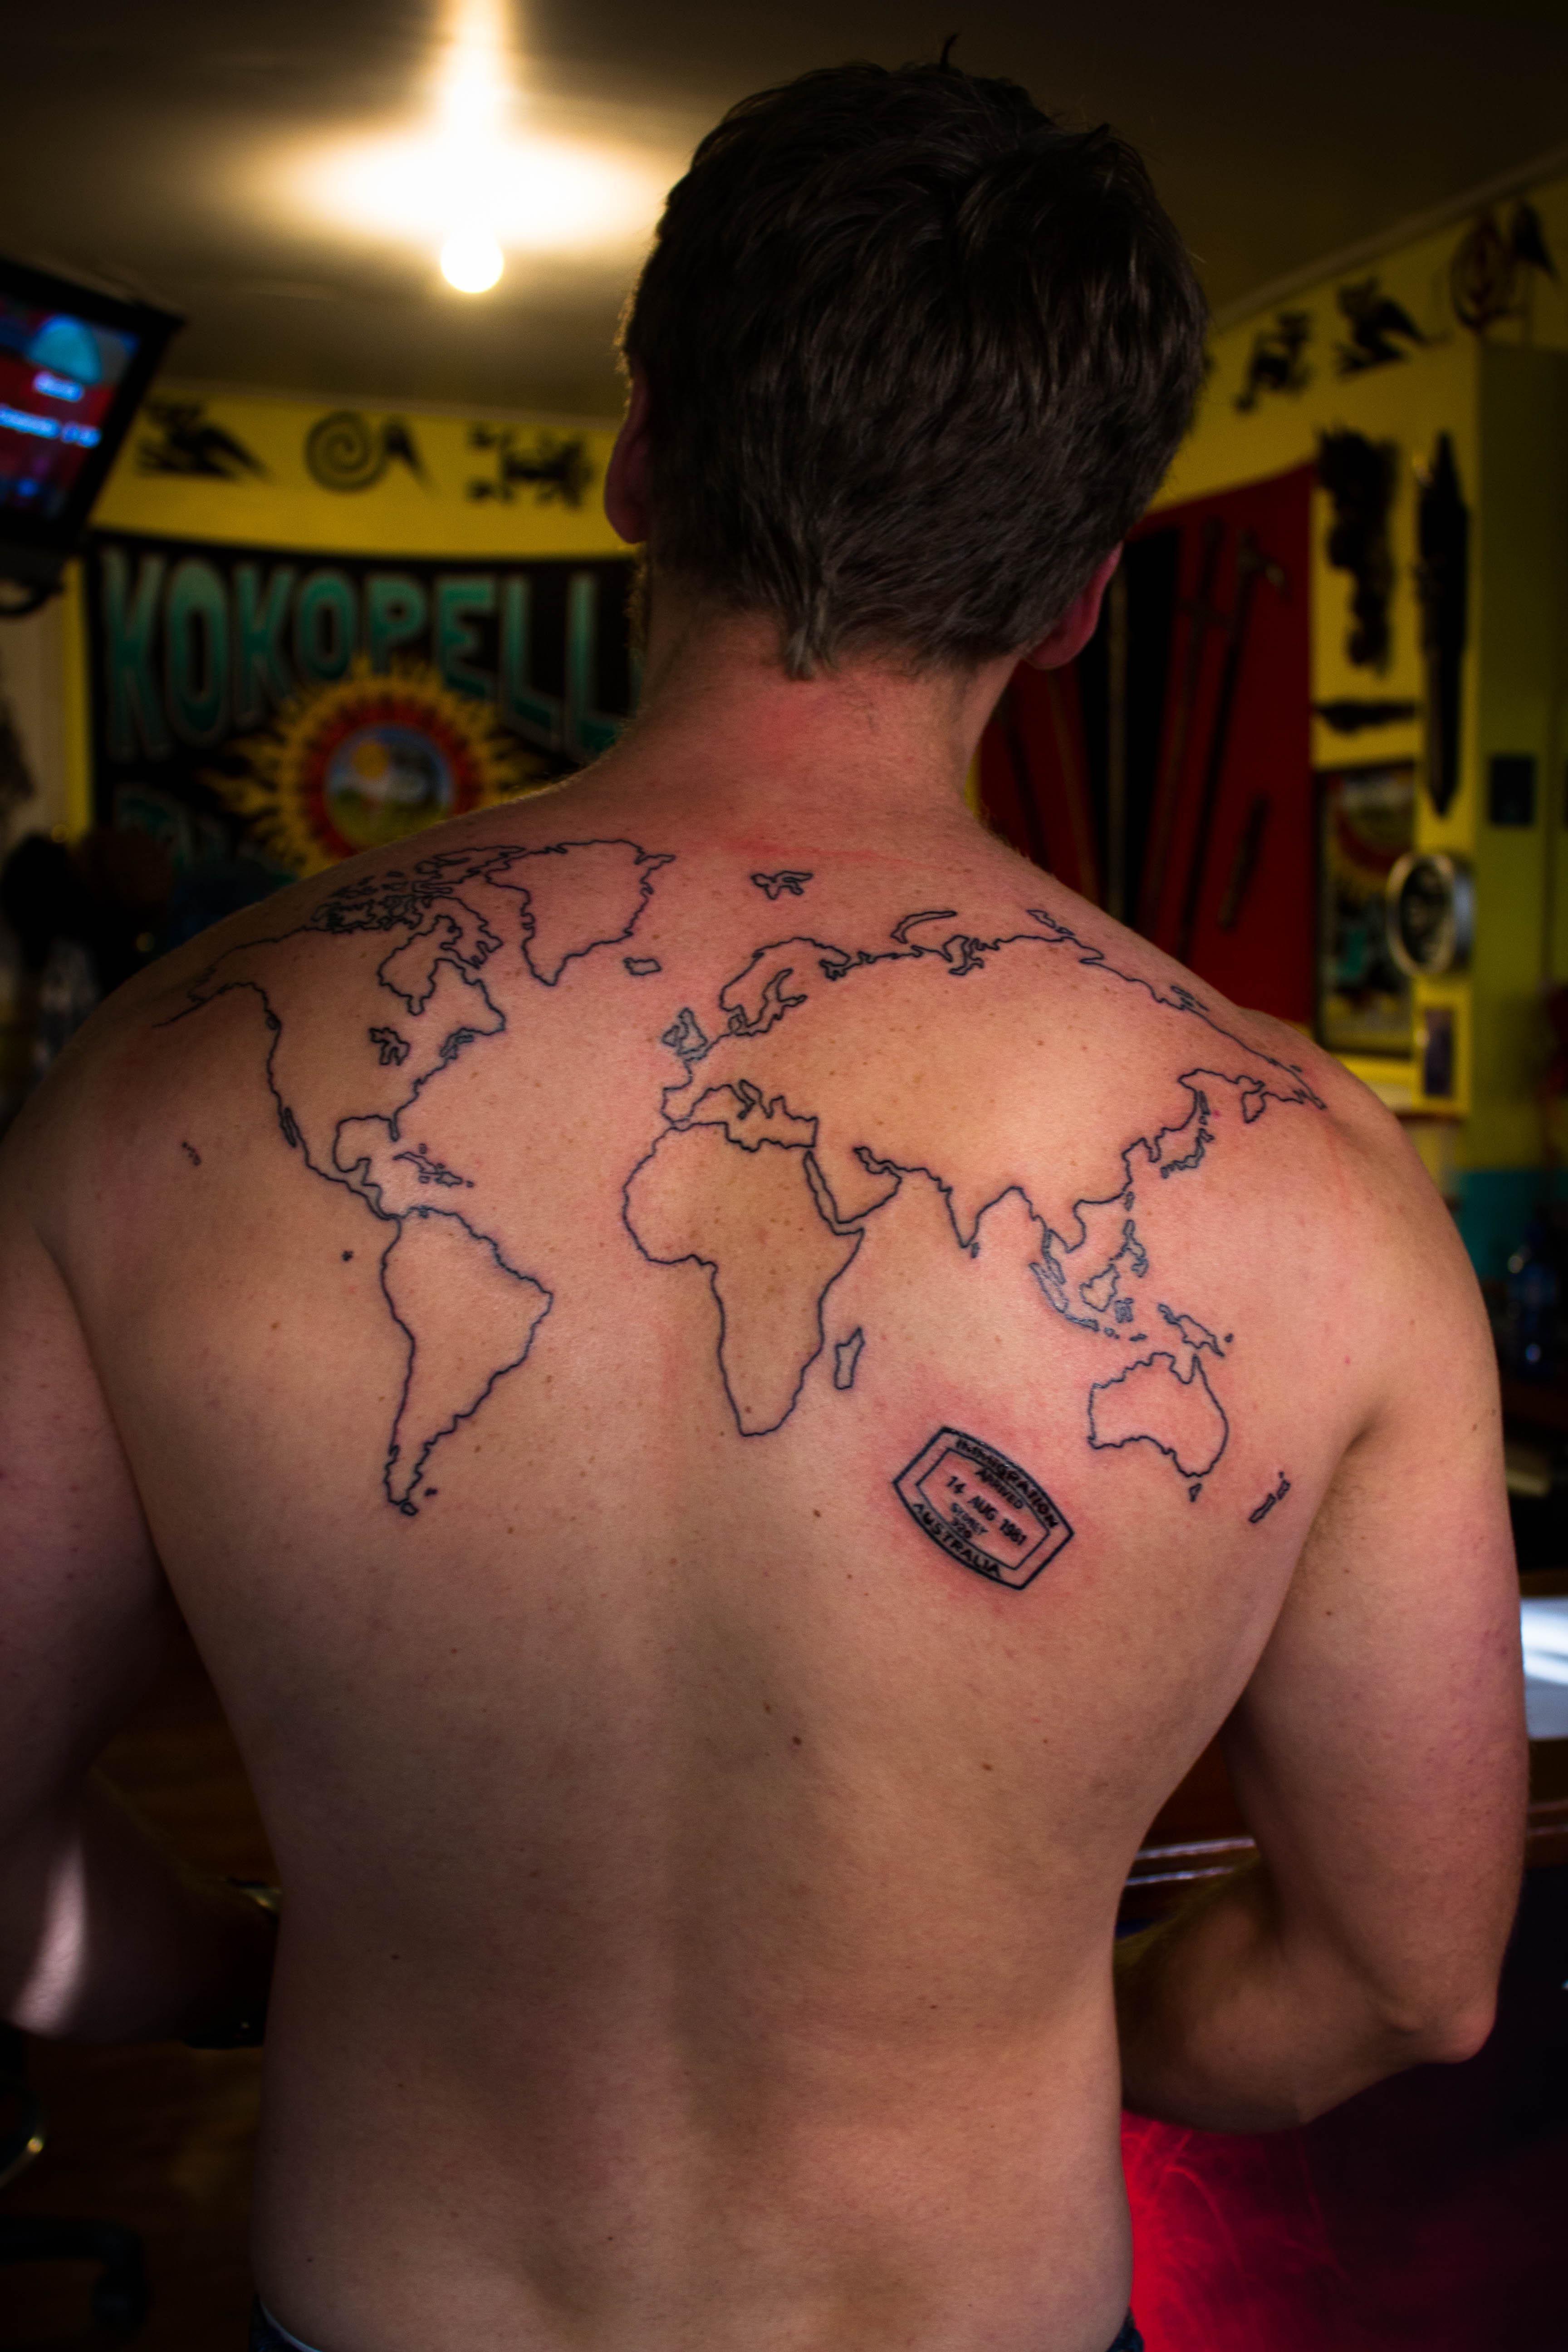 World map tattoo ankle world map tattoo pinterest world map tattoo ankle gumiabroncs Image collections